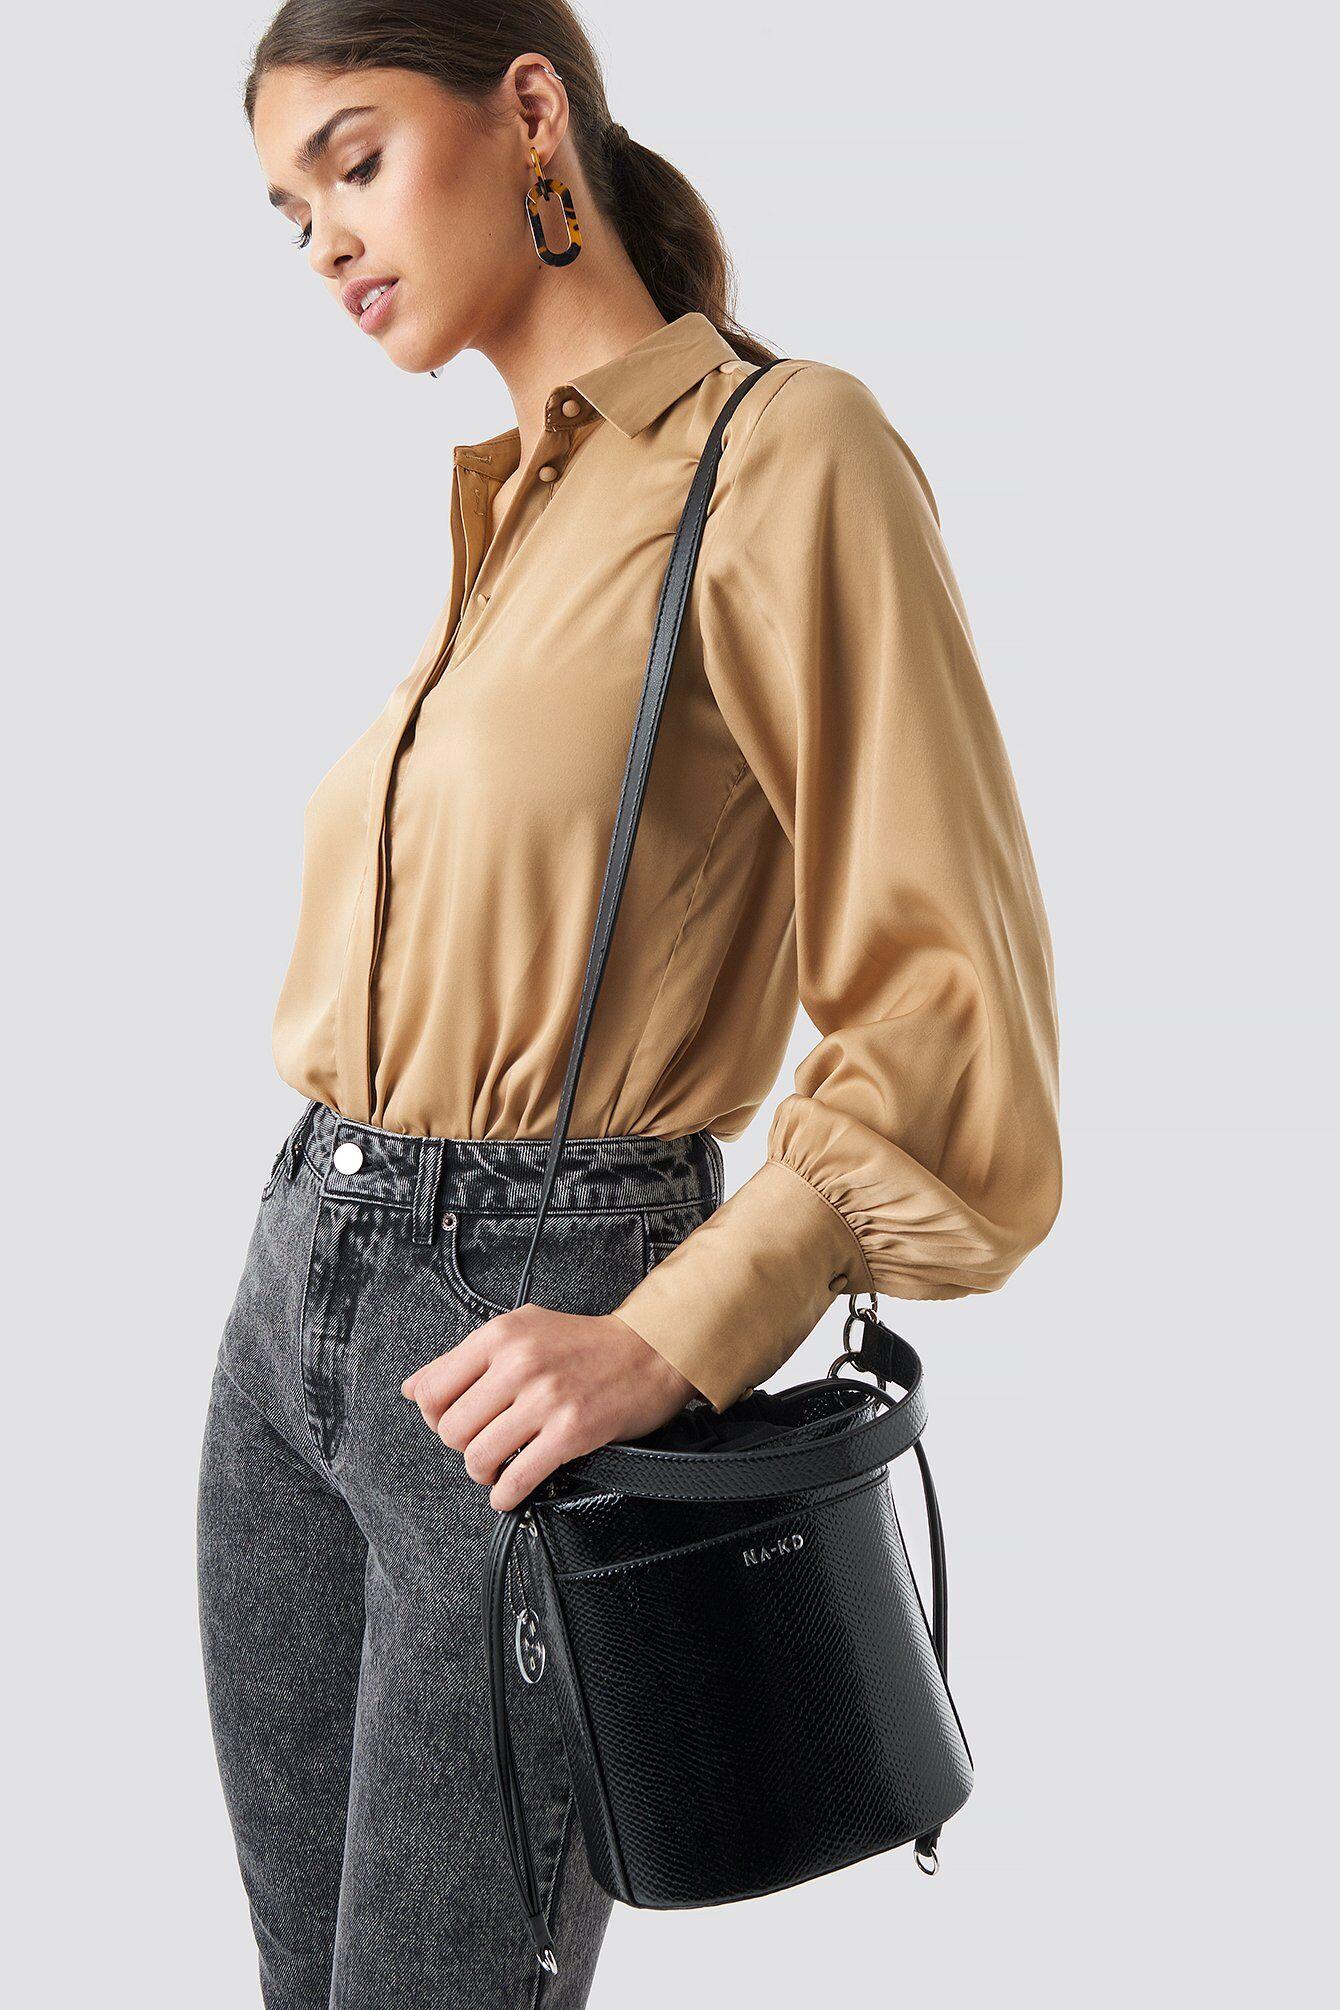 NA-KD Accessories Snake Bucket Bag - Black